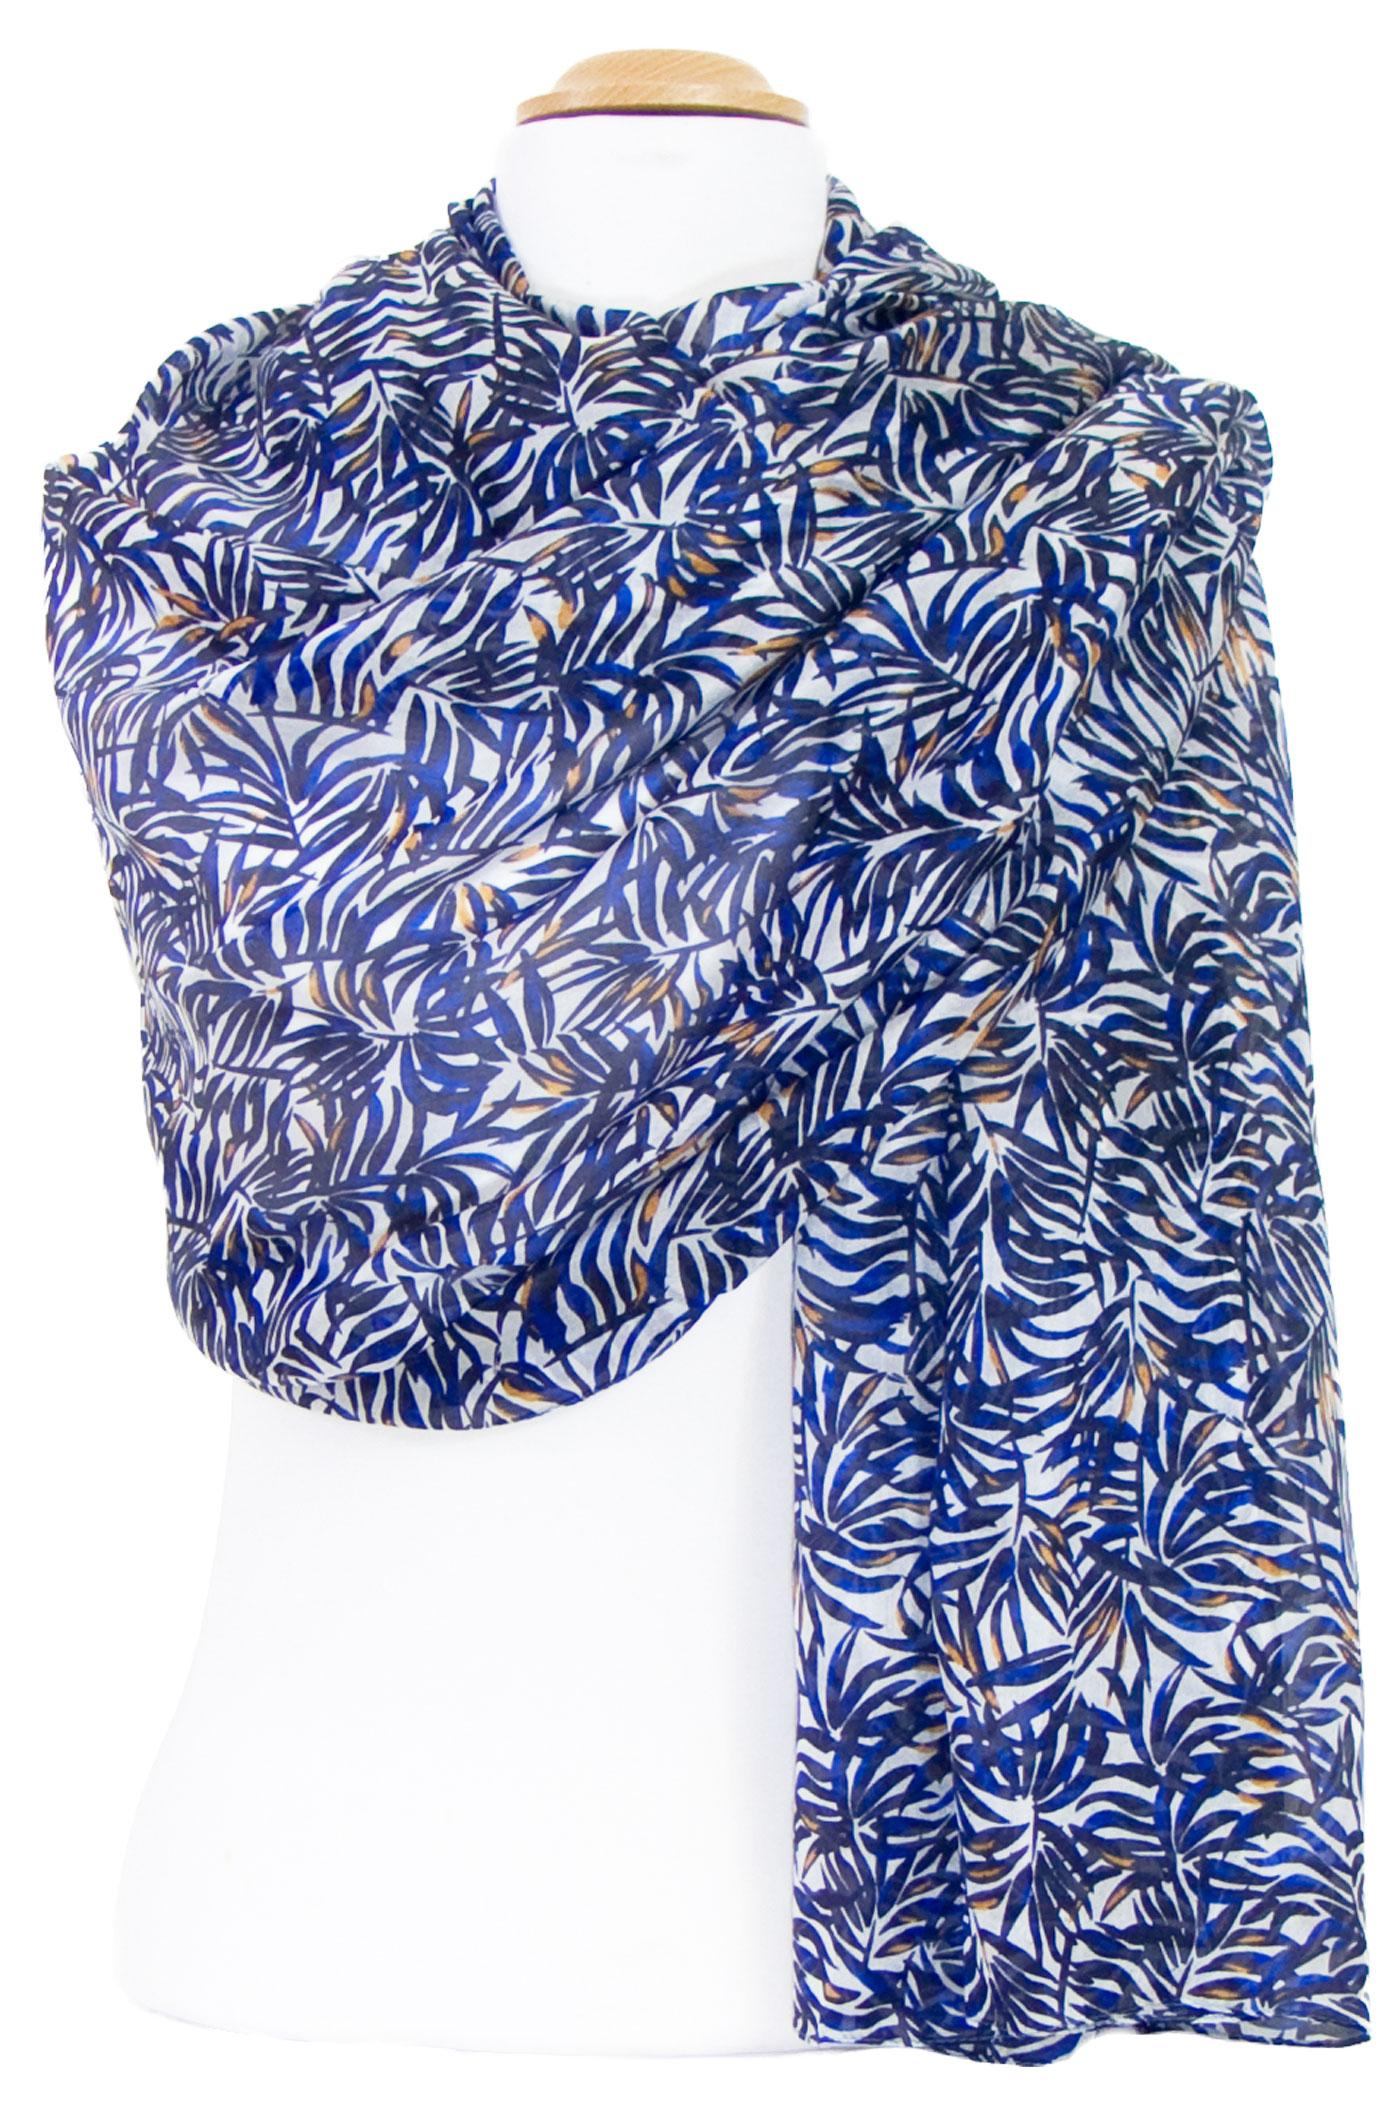 Etole soie bleu marine feuilles